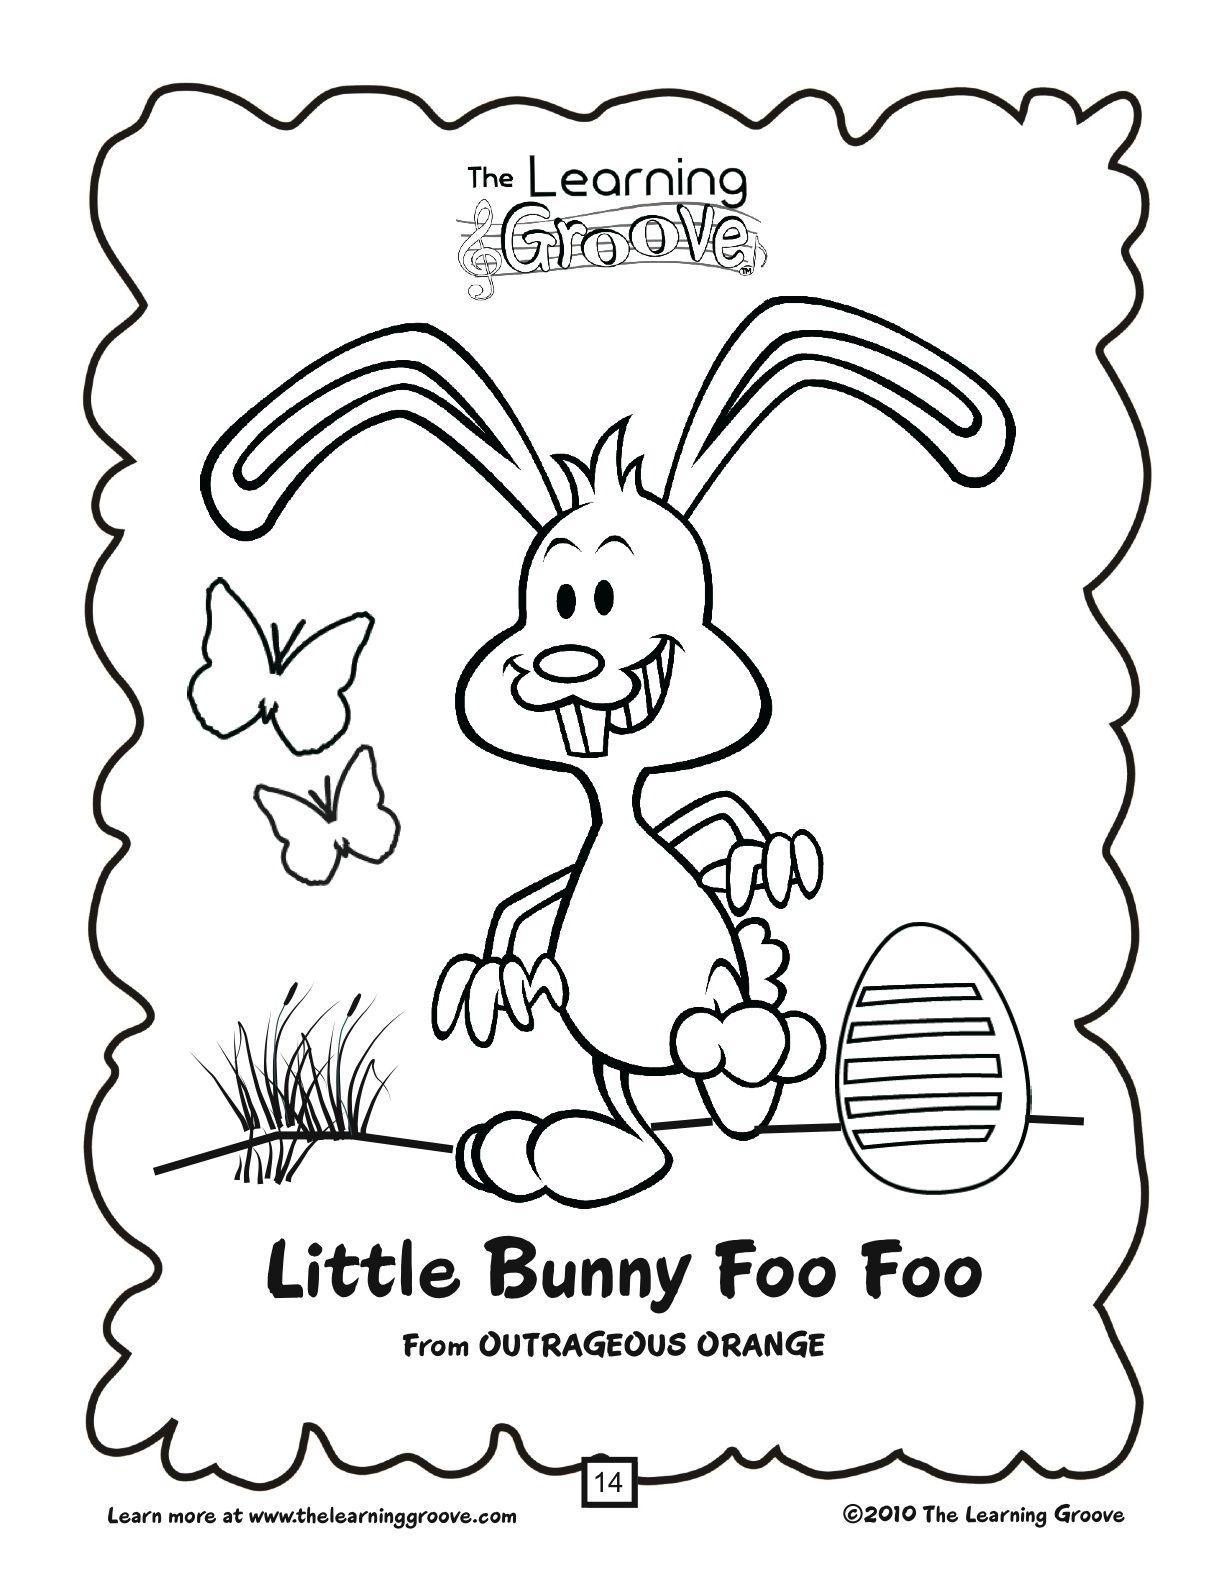 Little Bunny Foo Foo like you have never heard it before